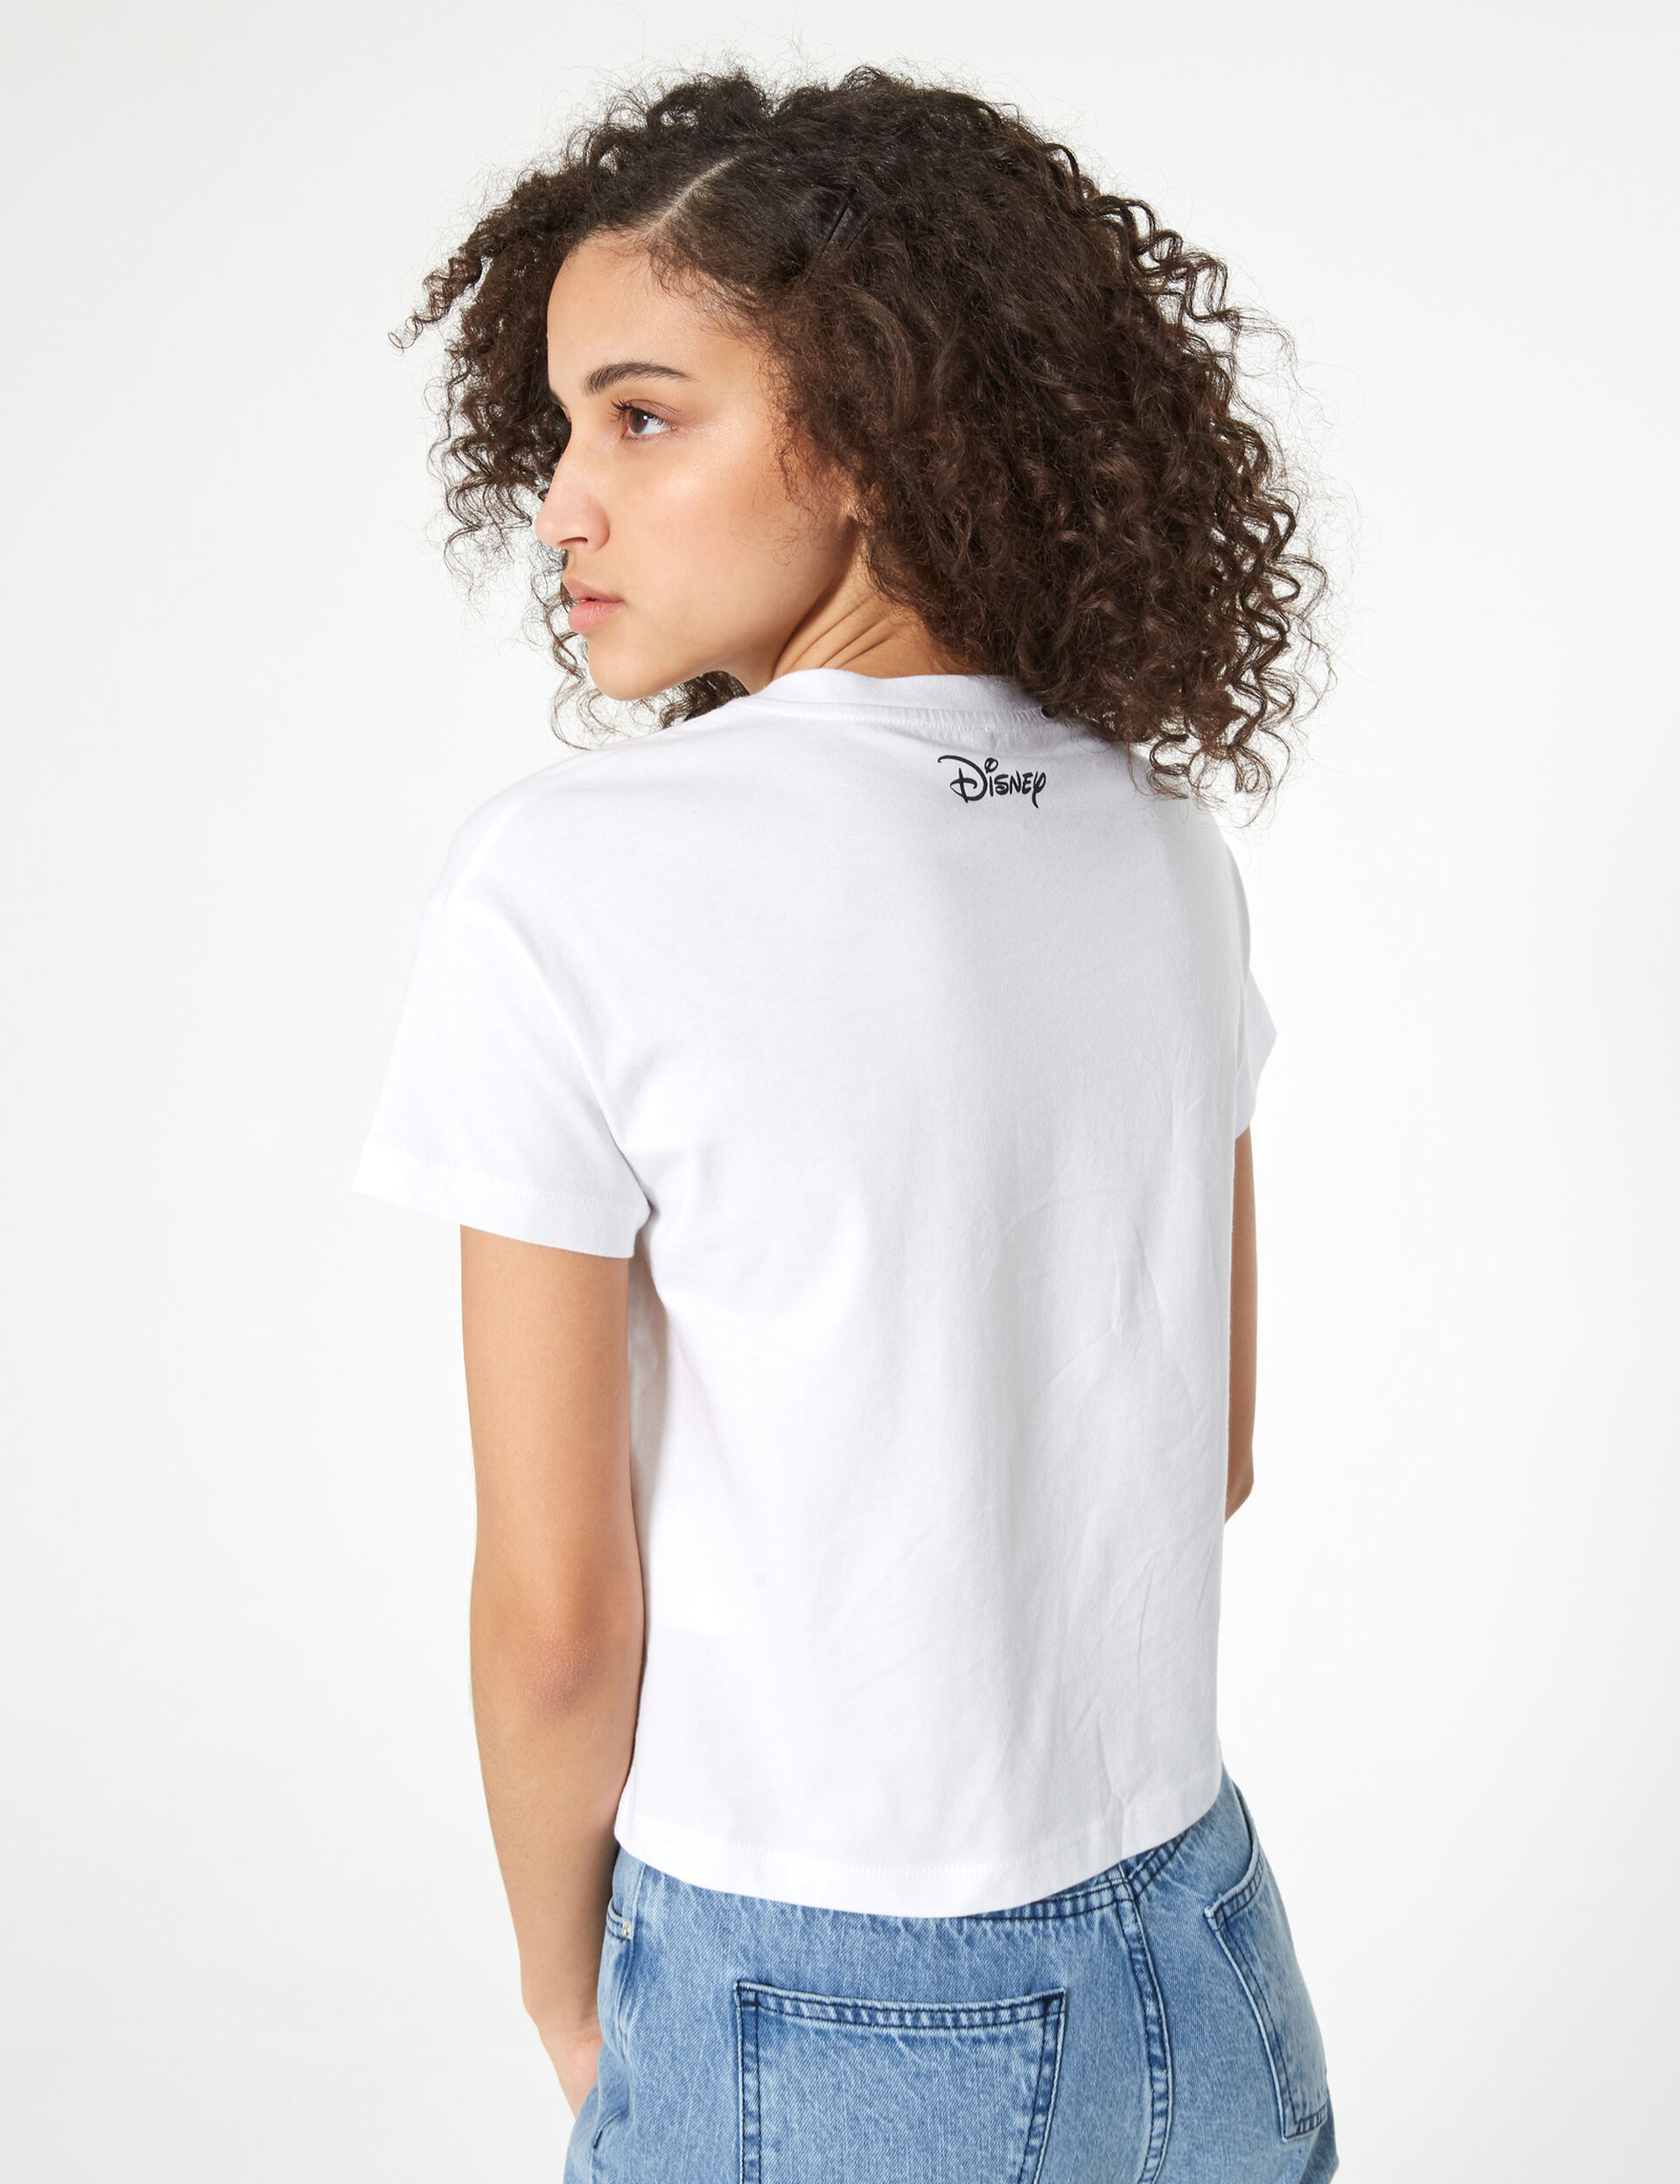 Tee-shirt Disney Ariel